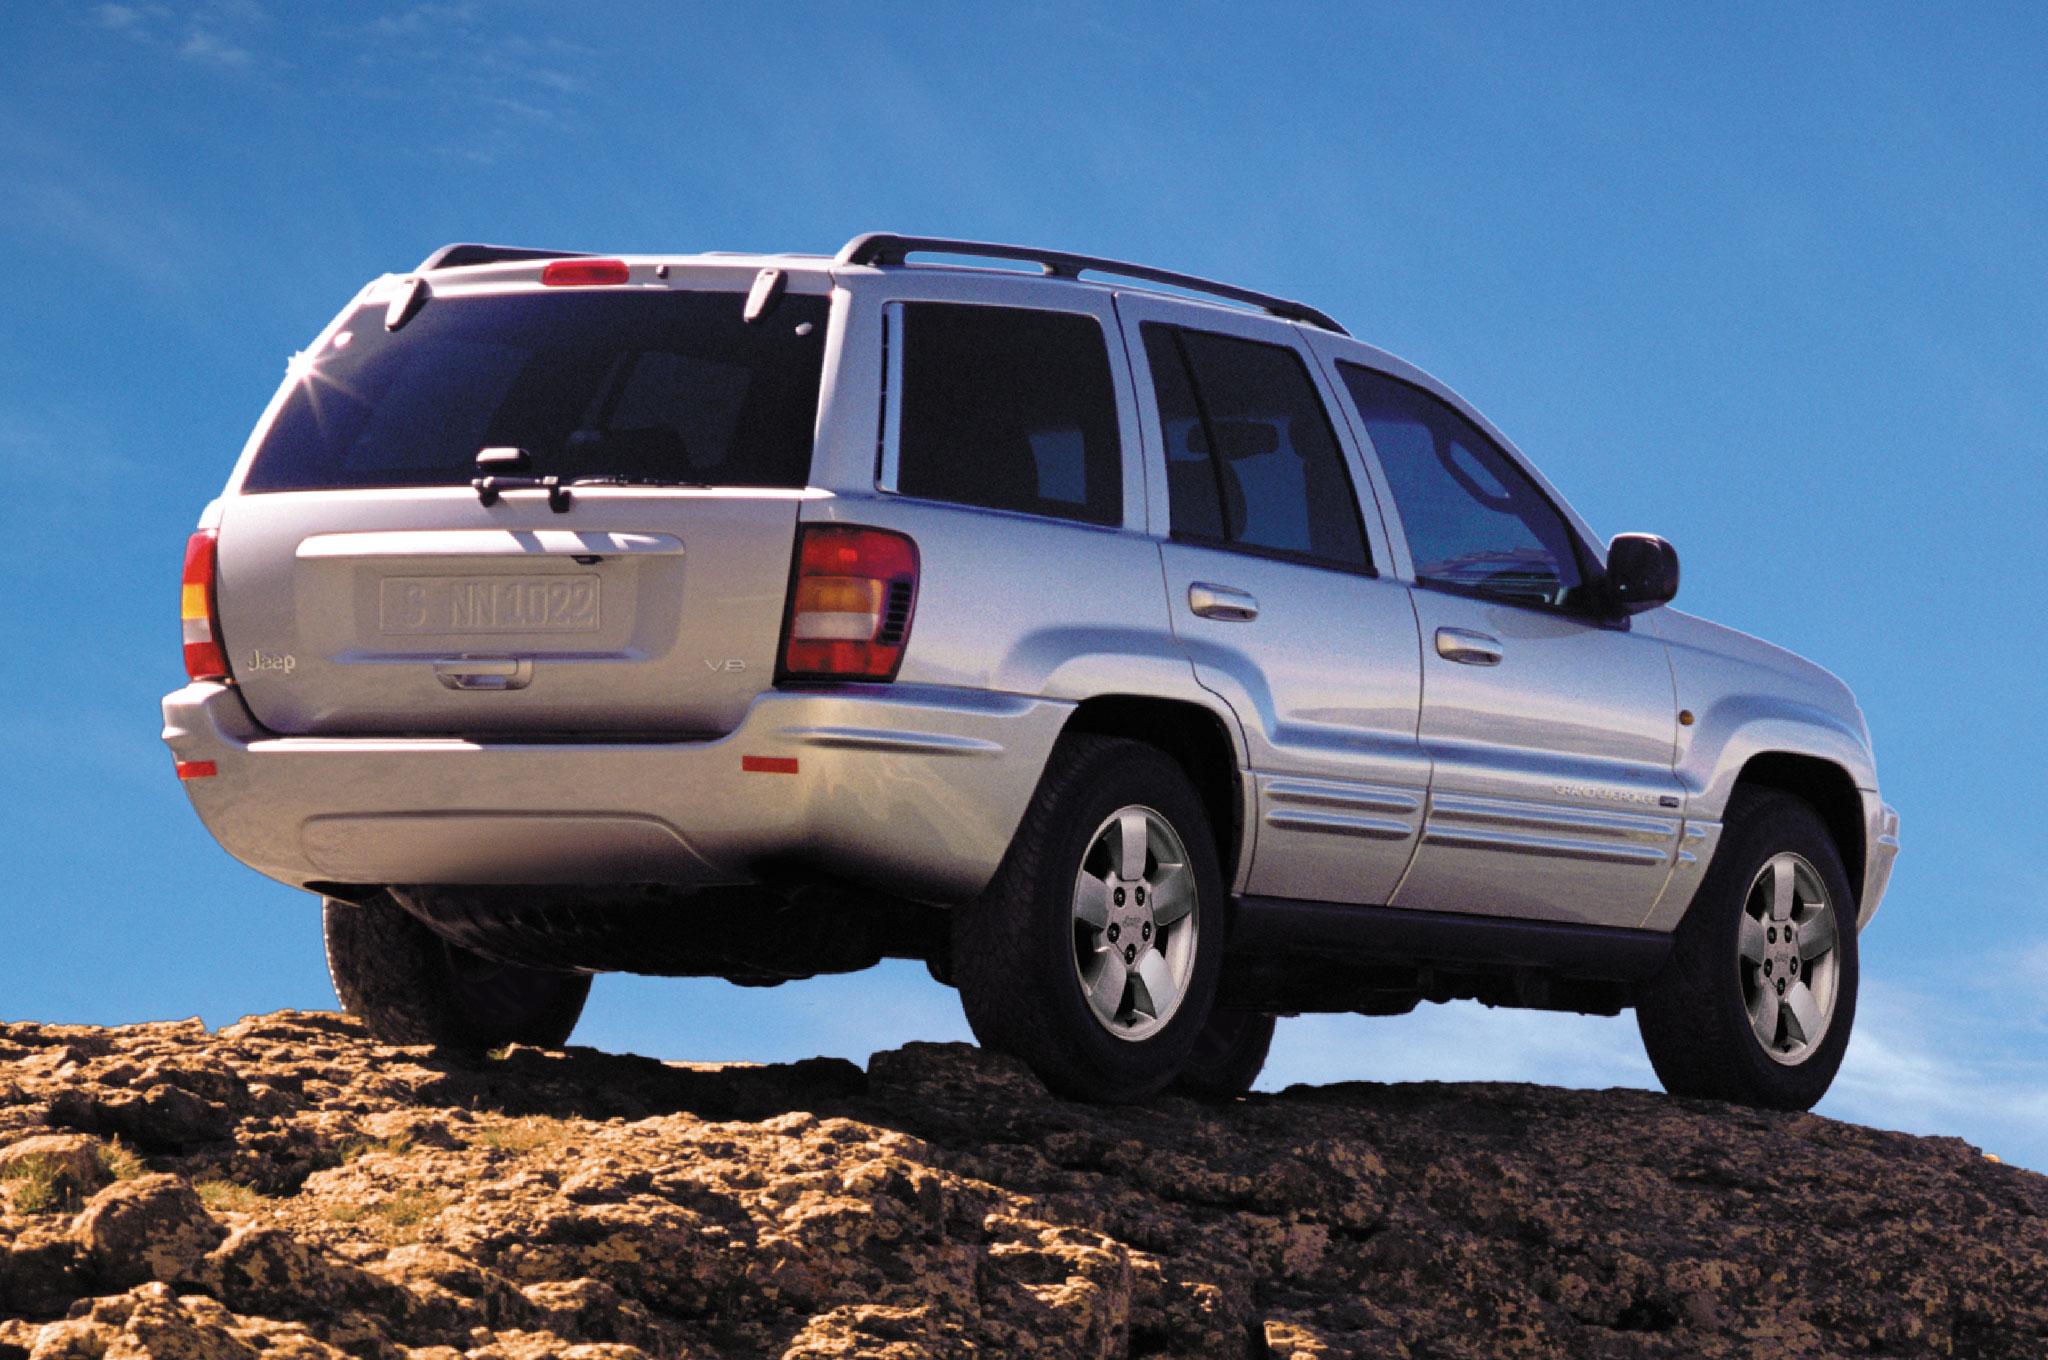 Chrysler Agrees To Recall 2.7 Million Jeep Grand Cherokee ...